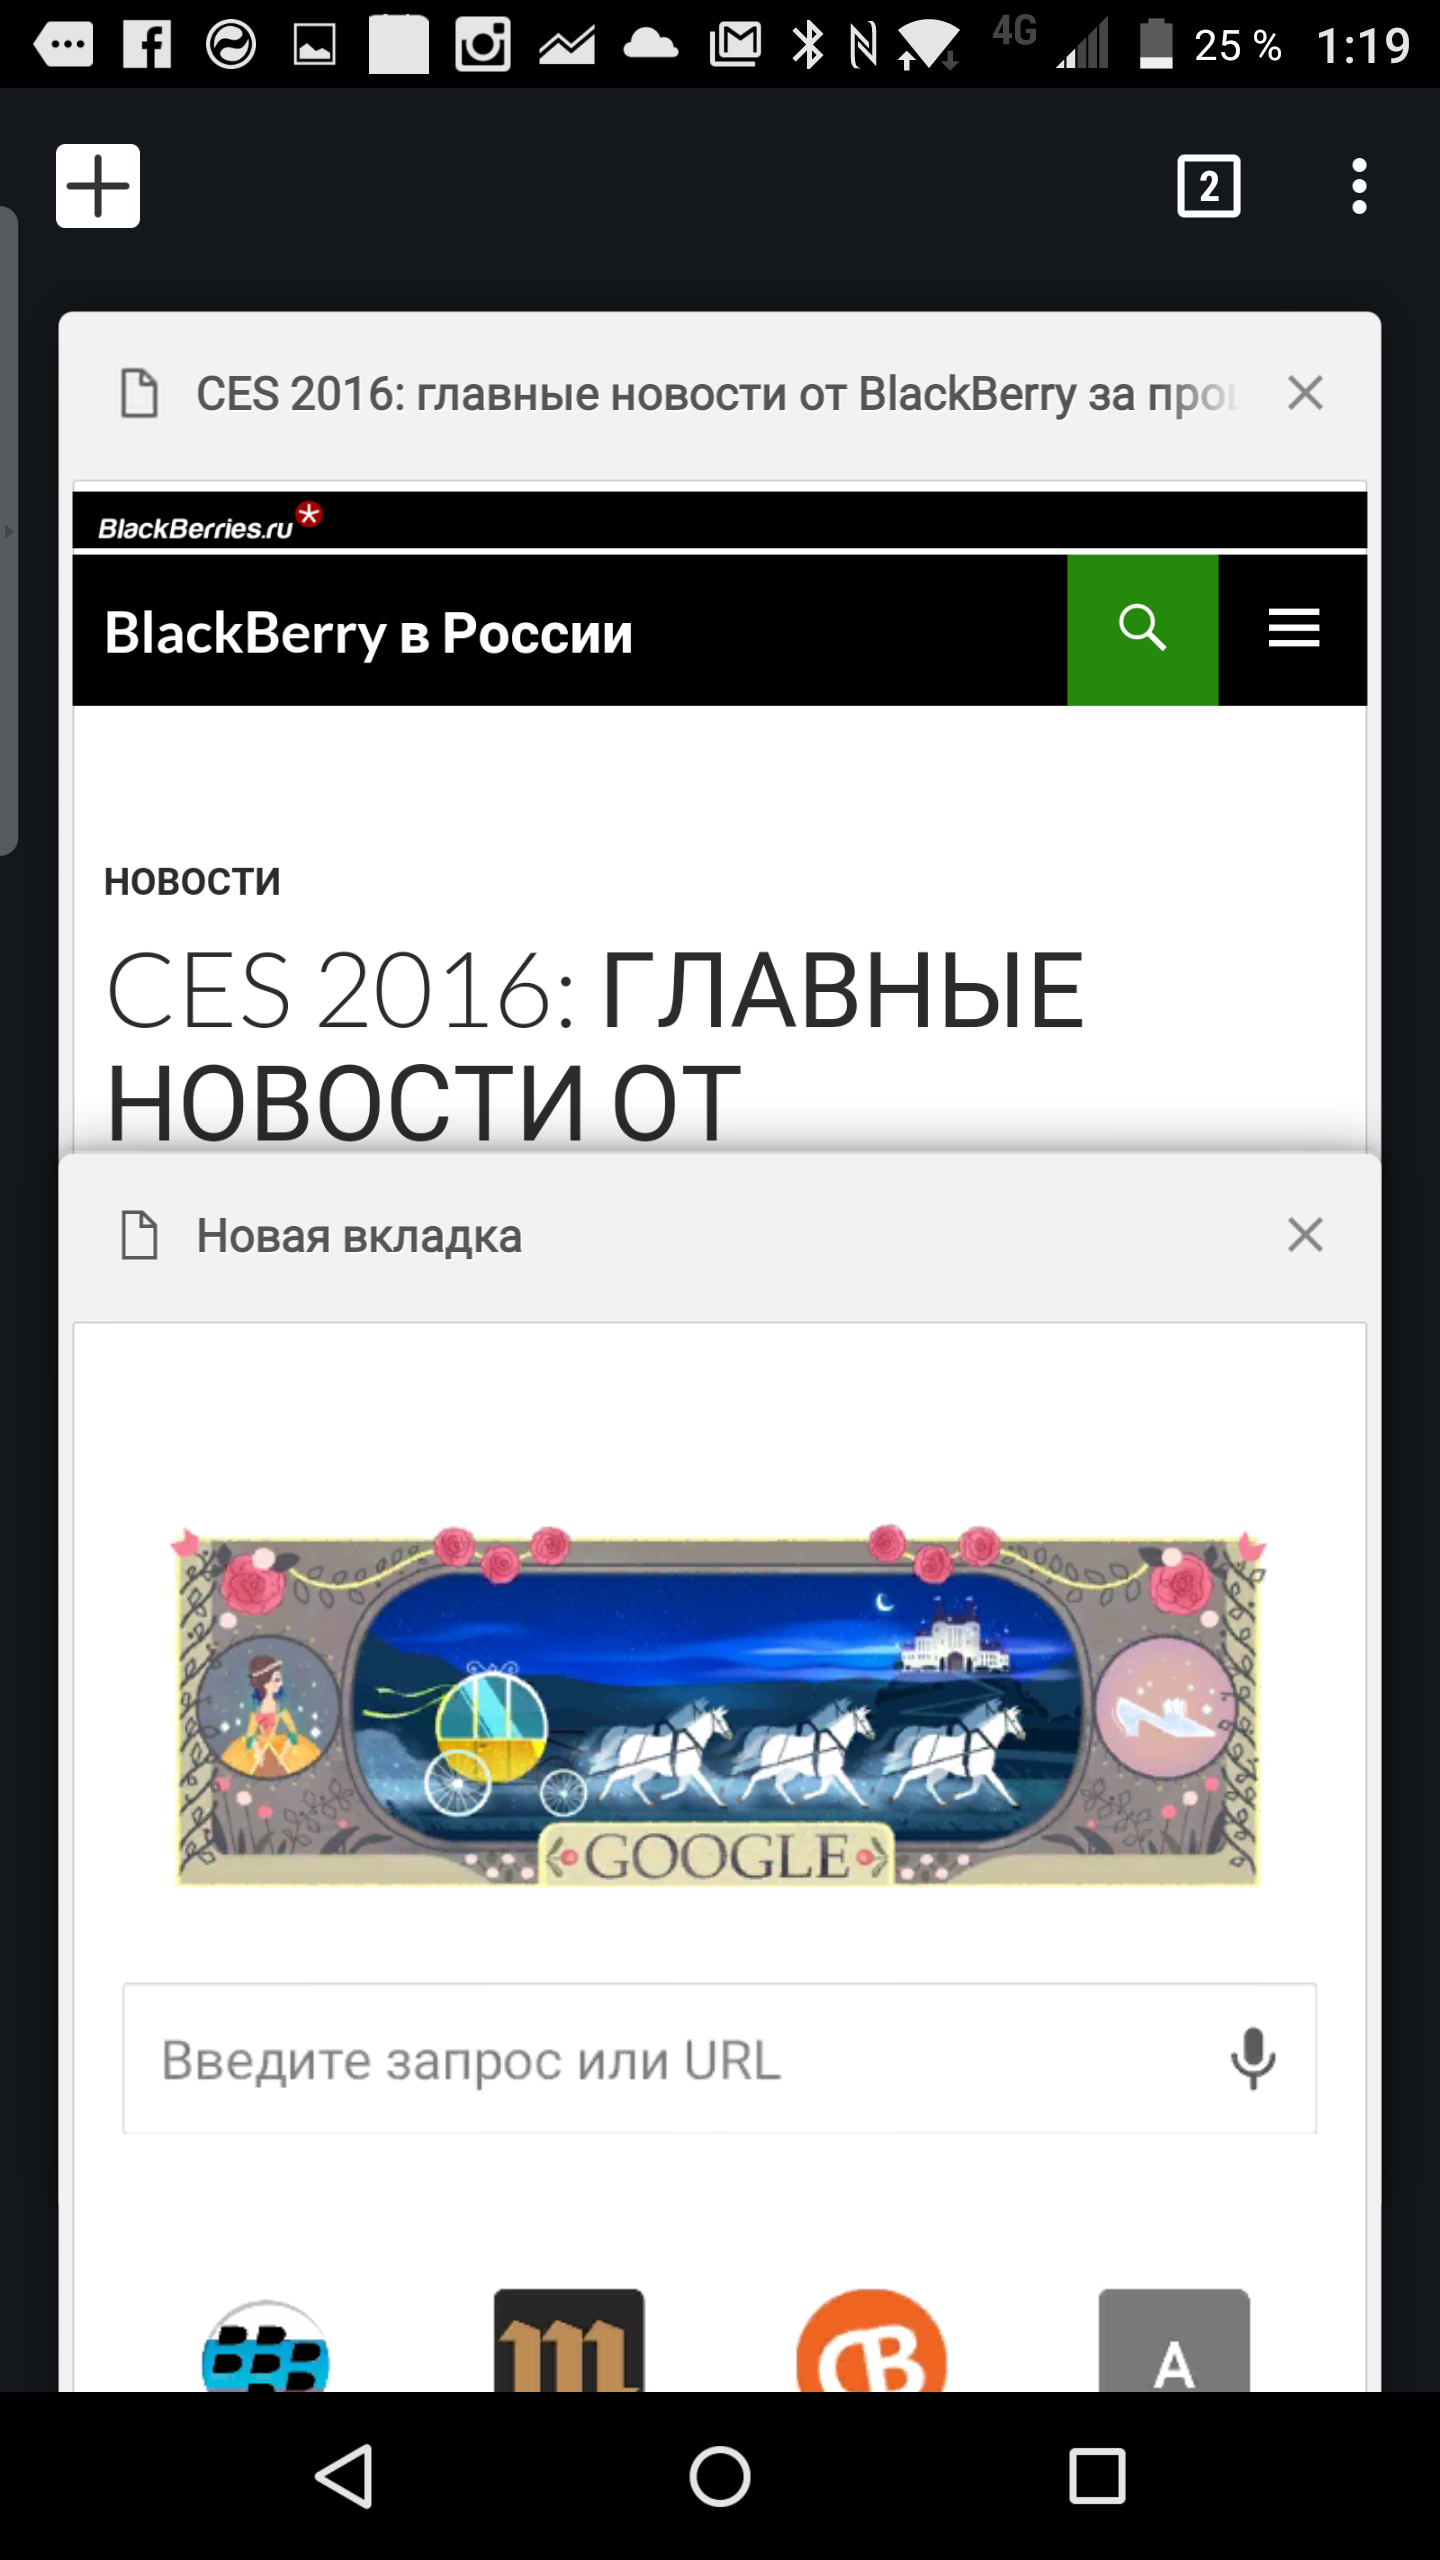 Screenshot_2016-01-12-01-19-59